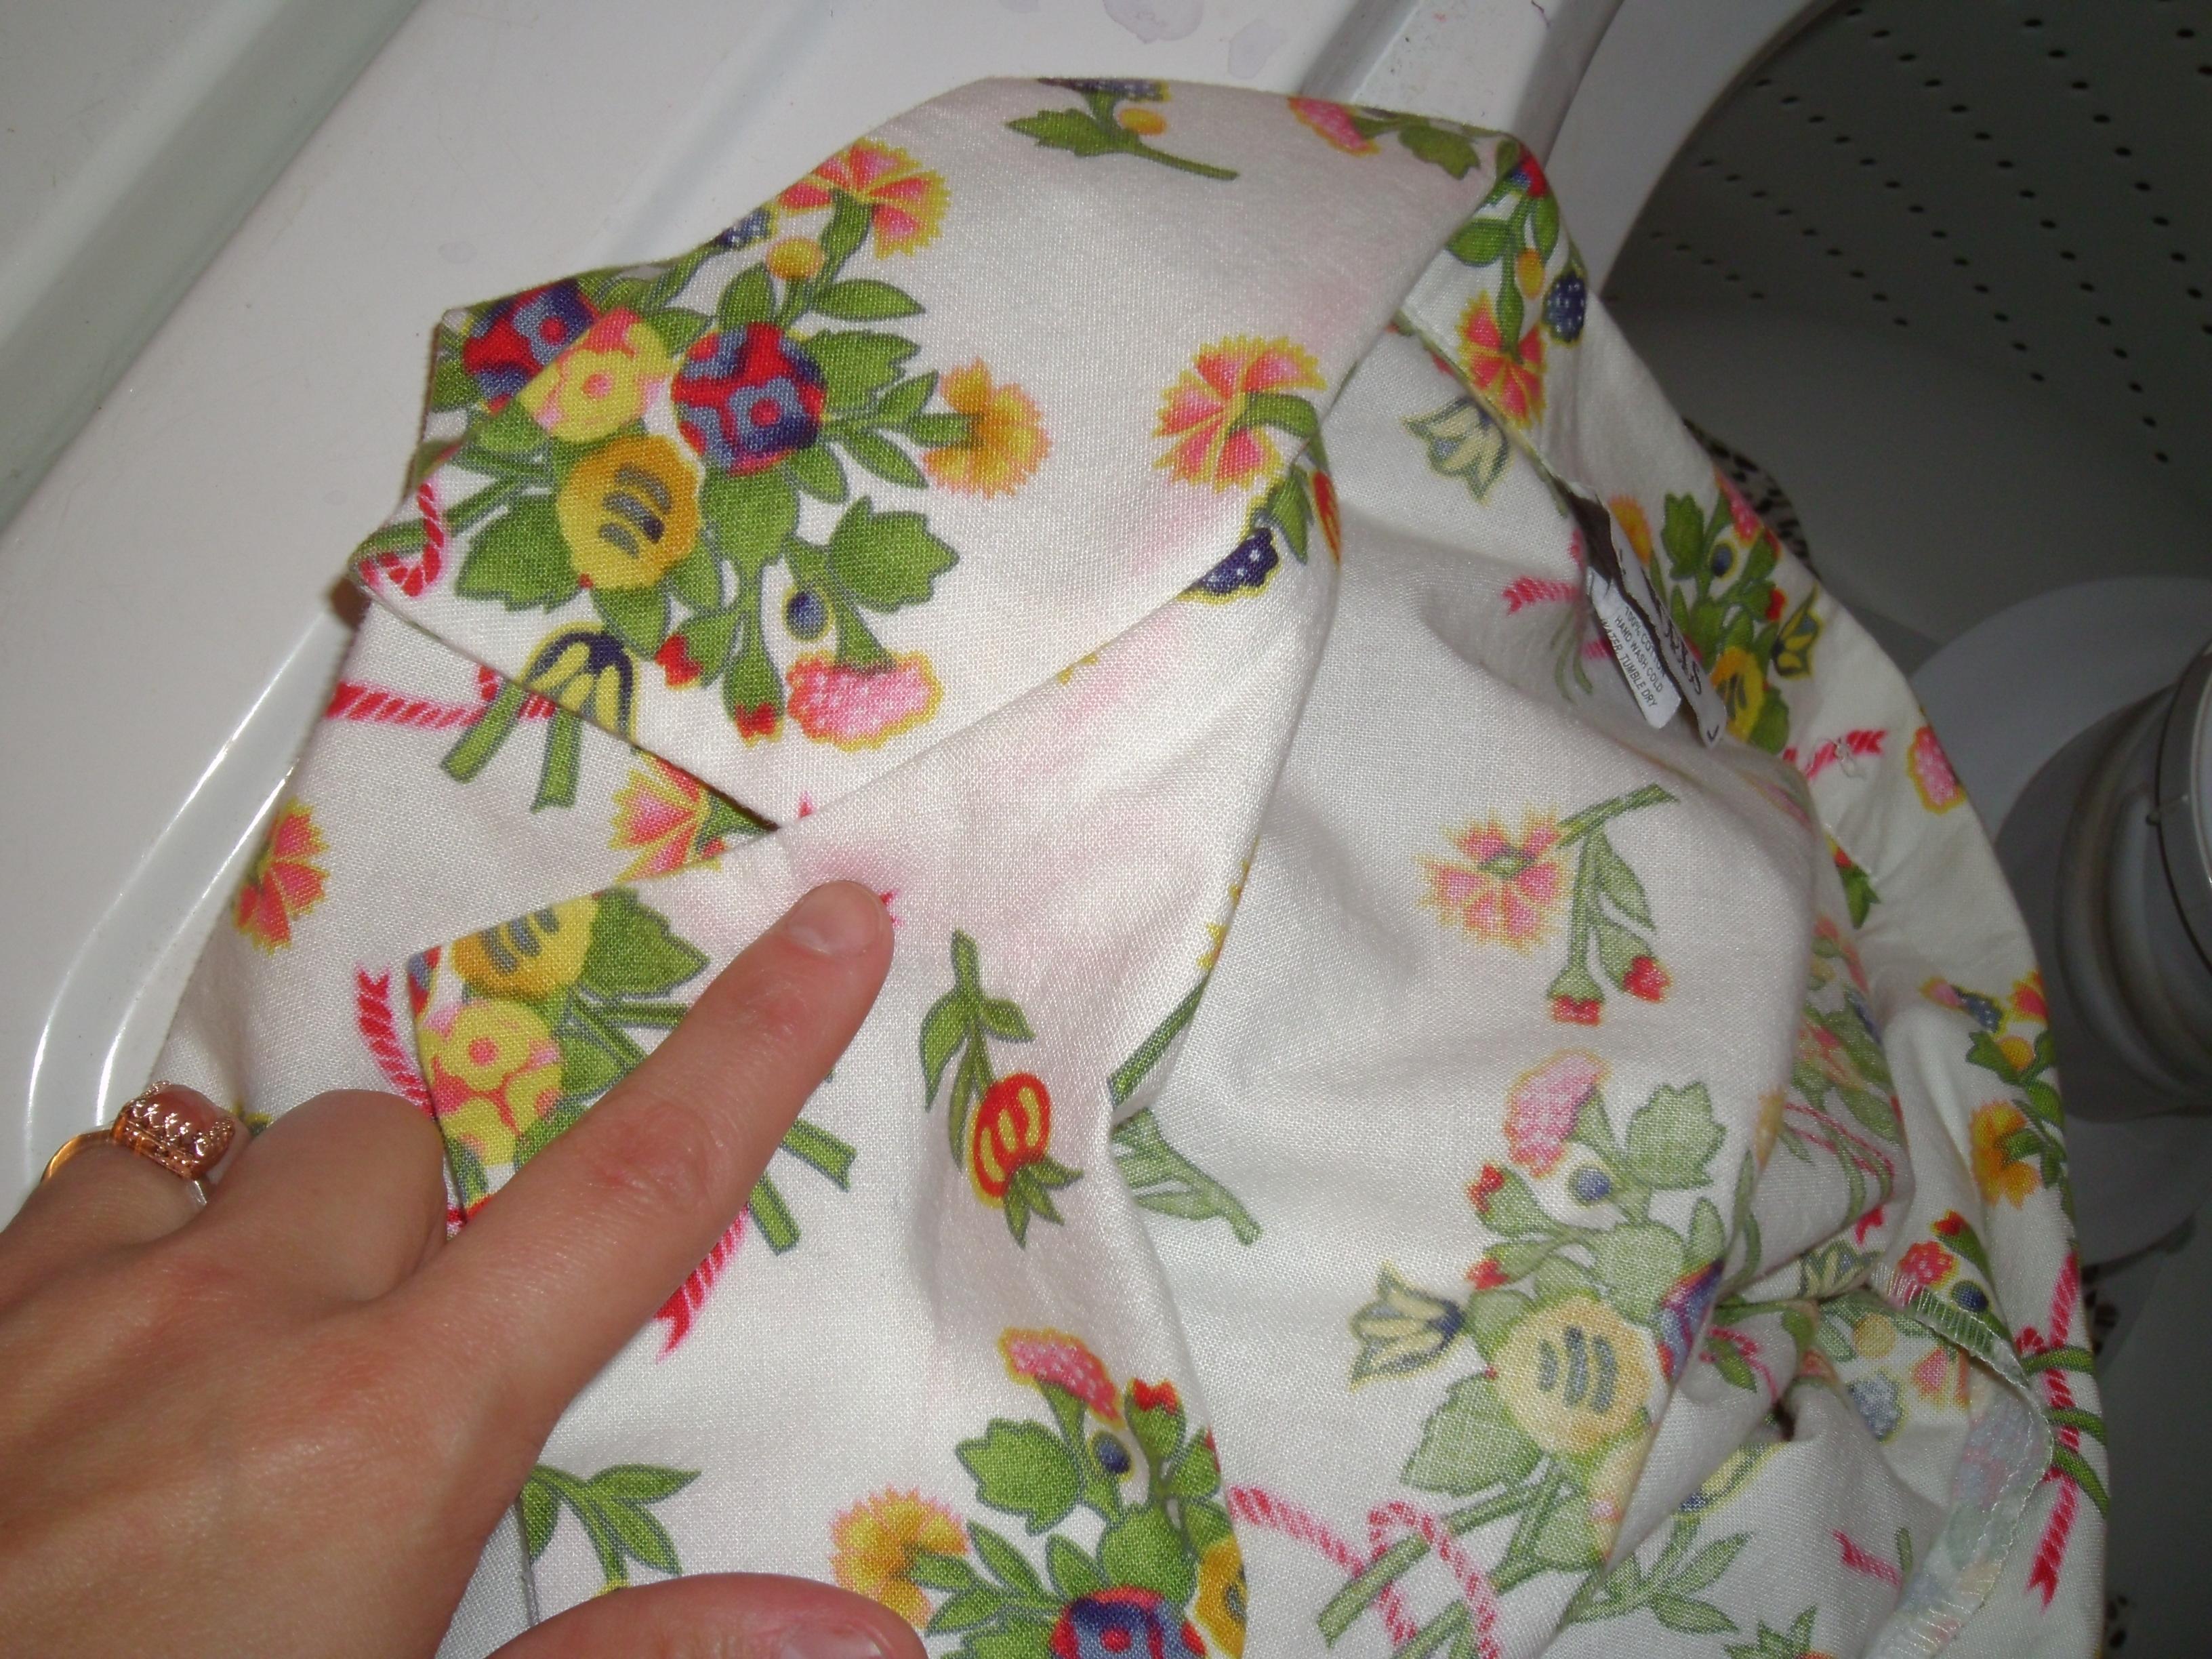 Day 92: June Cleaver Dress 3